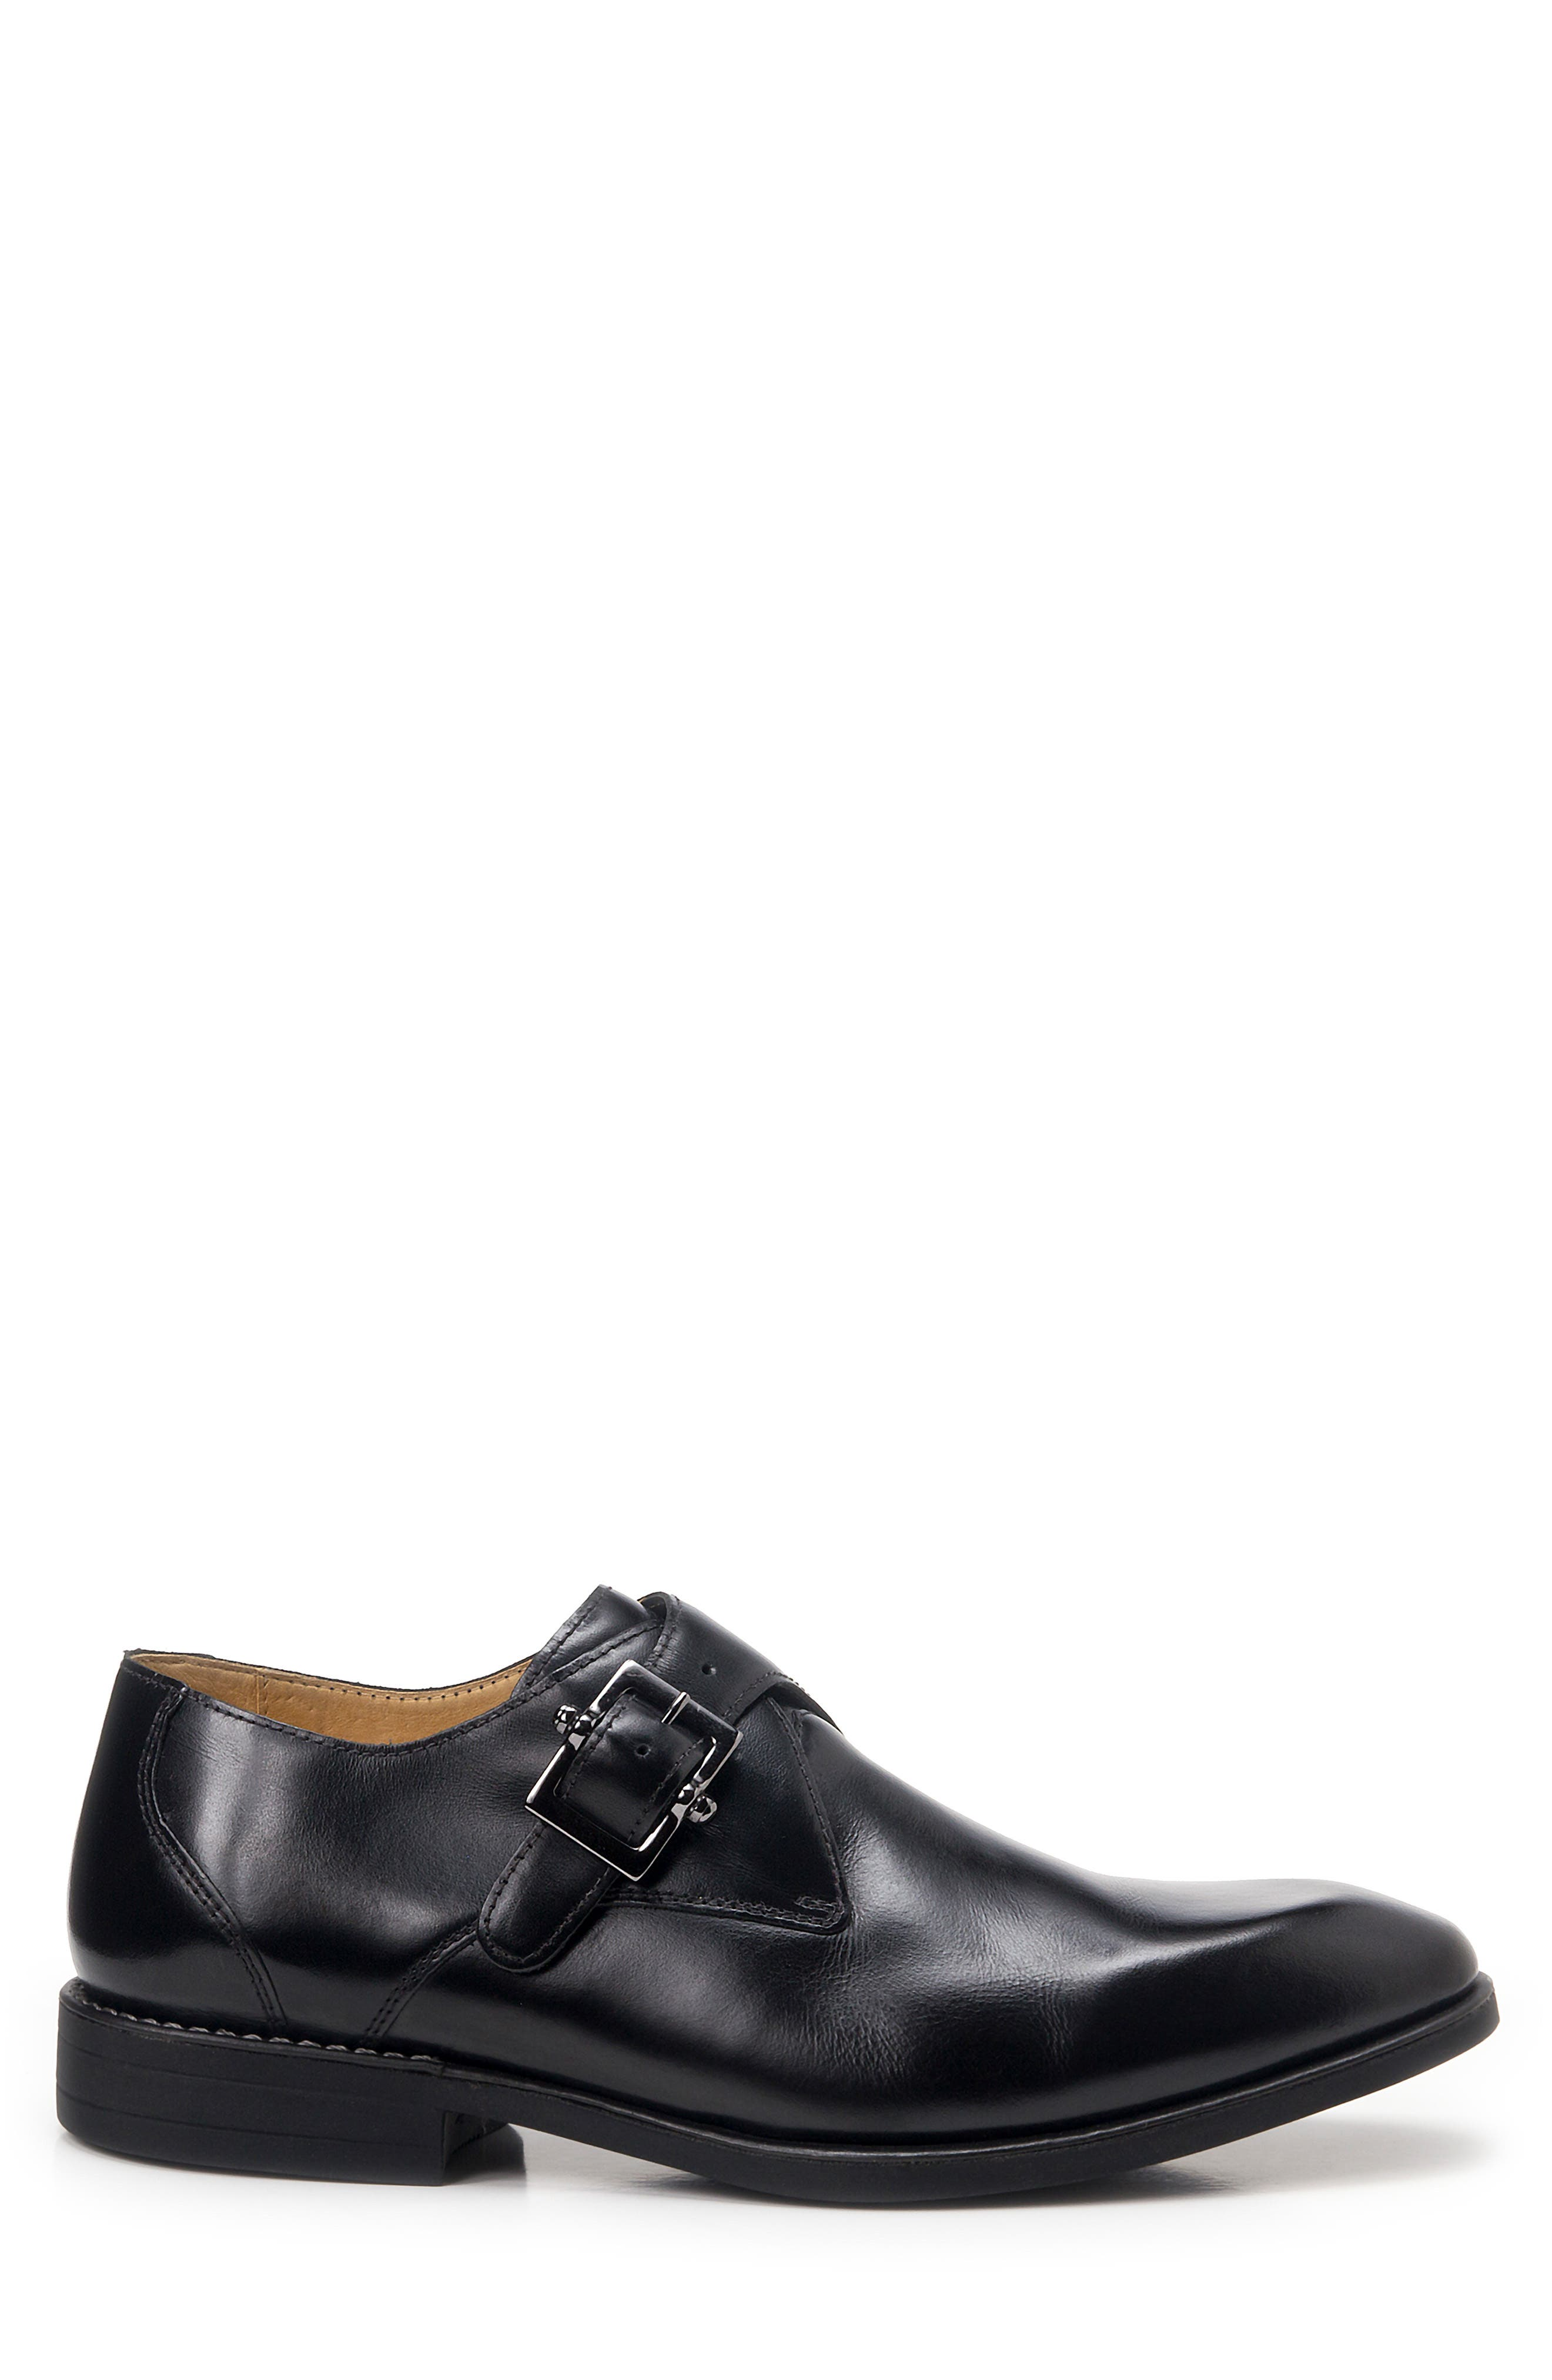 Wendell Single Buckle Monk Shoe,                             Alternate thumbnail 3, color,                             BLACK LEATHER